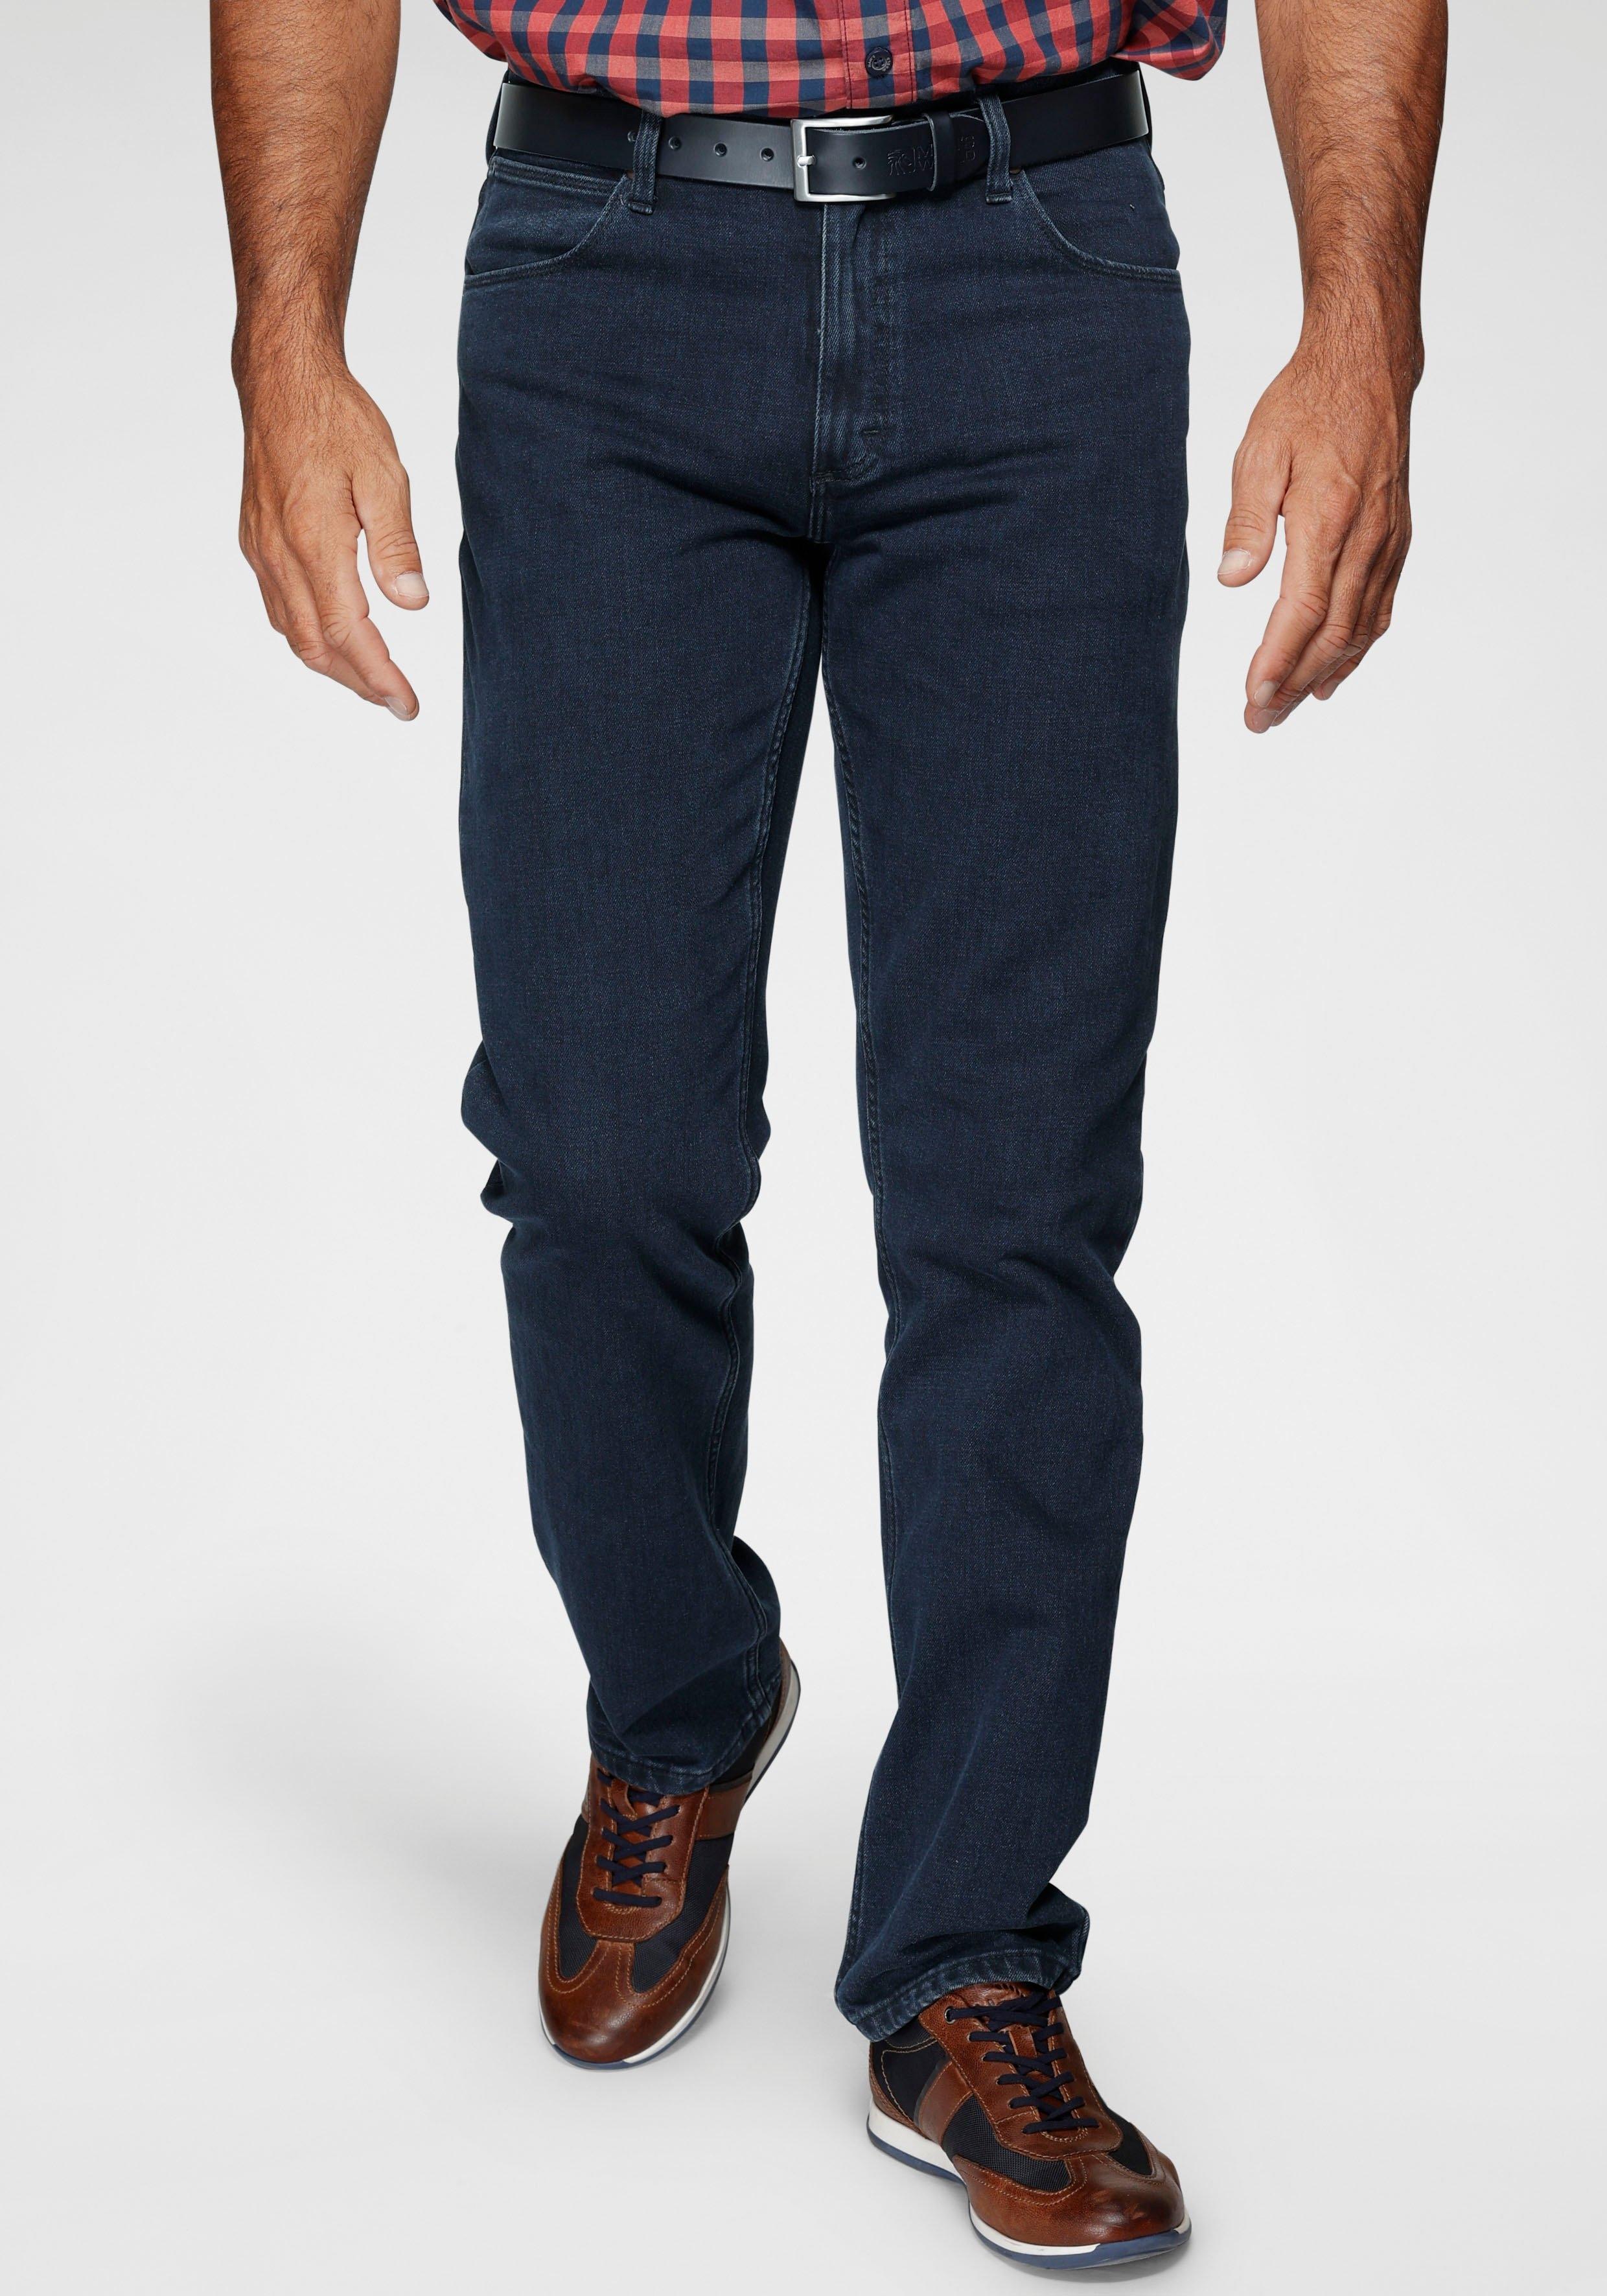 Wrangler straight jeans Authentic Straight voordelig en veilig online kopen